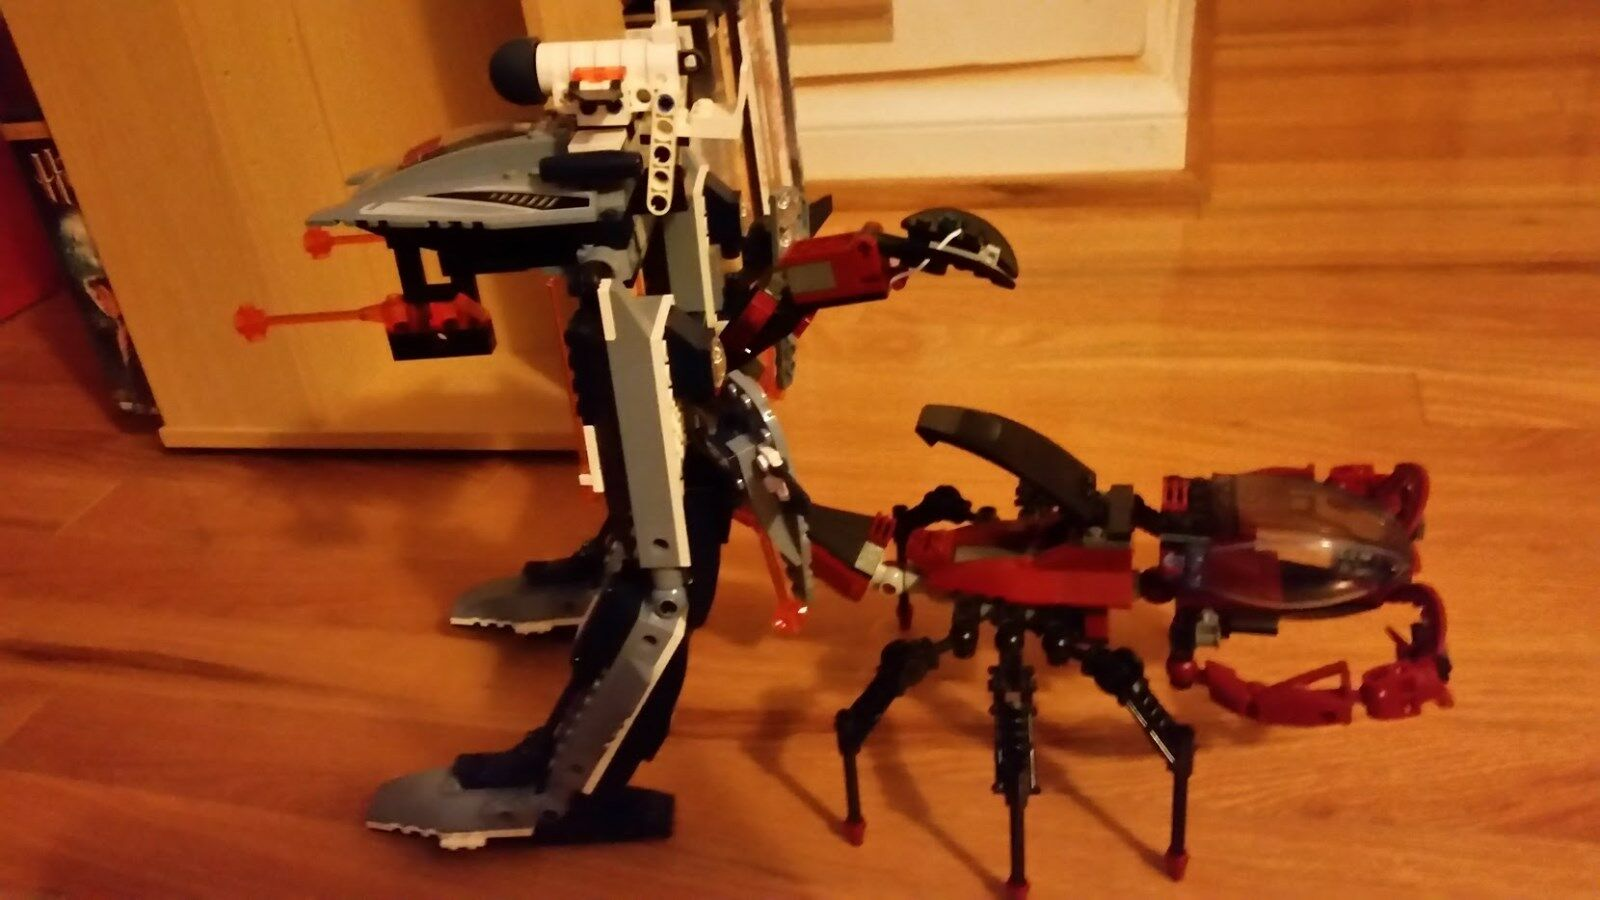 Lego Alpha Team Blizzard Blaster (4770)